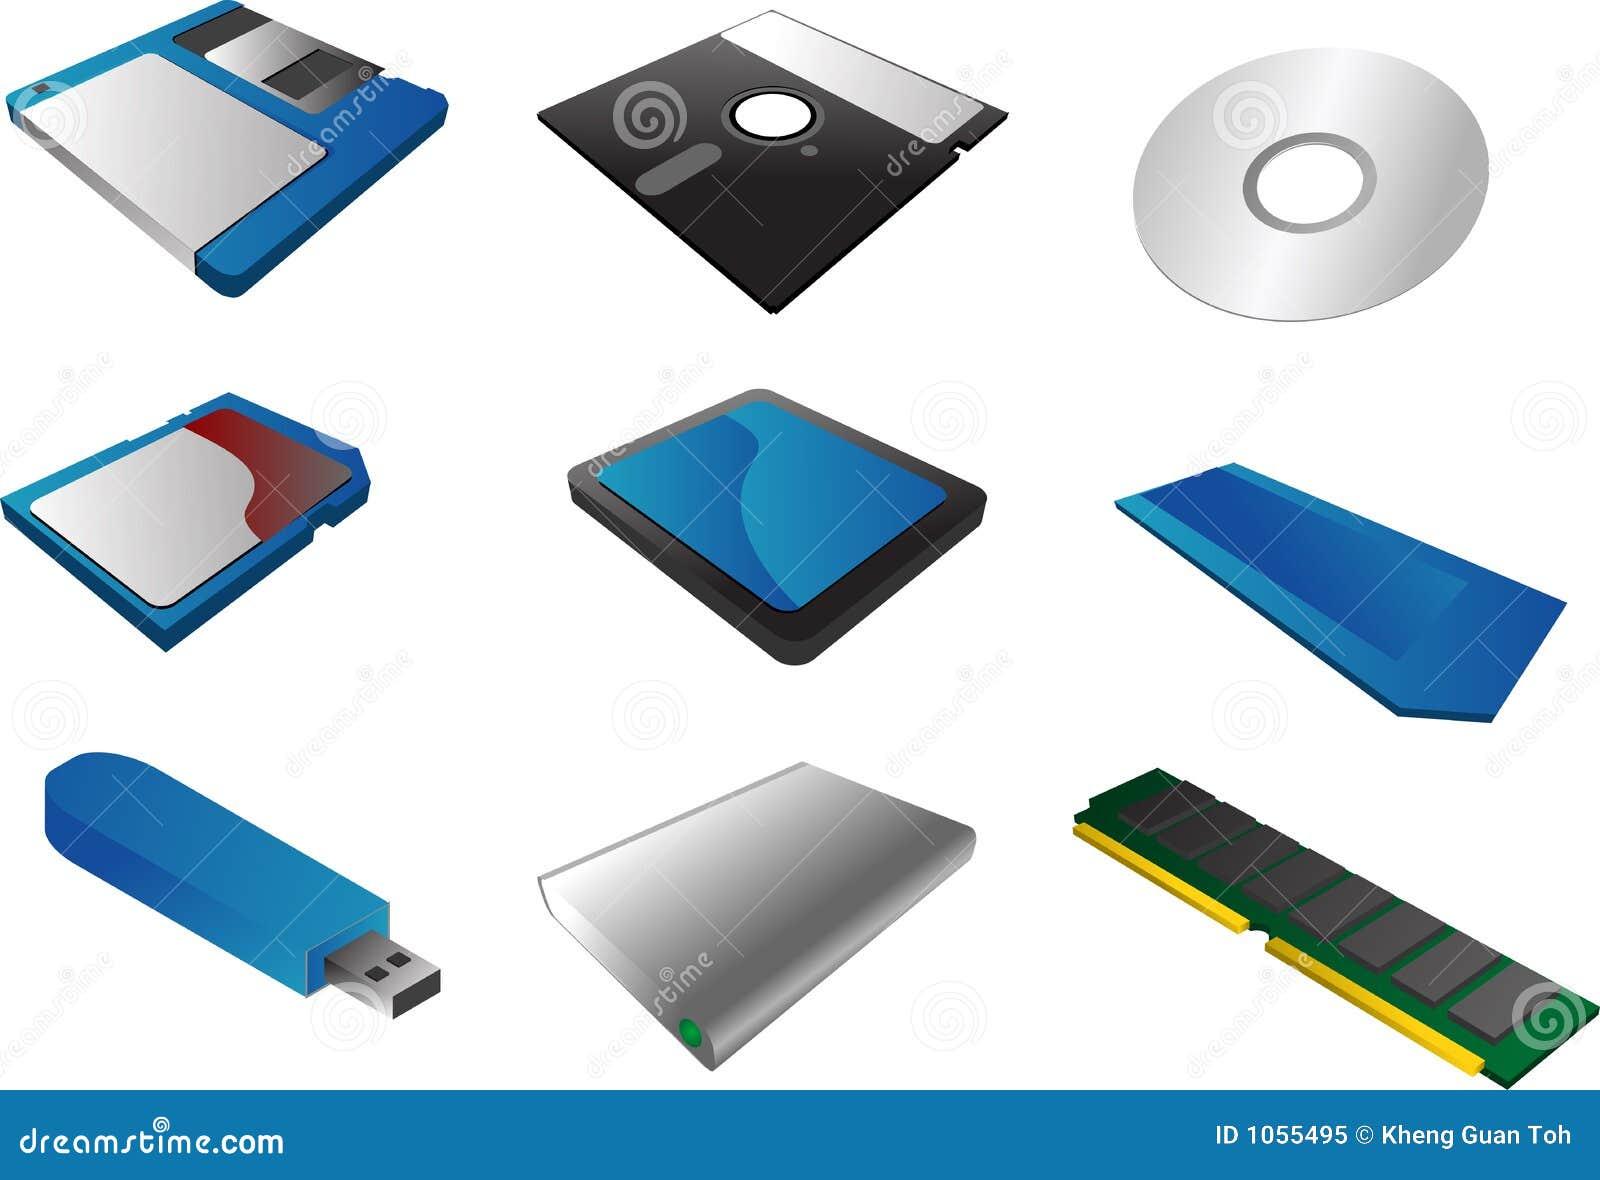 ... disk, ram memoryhttp://www.dreamstime.com/modify.php?imageid=1055502